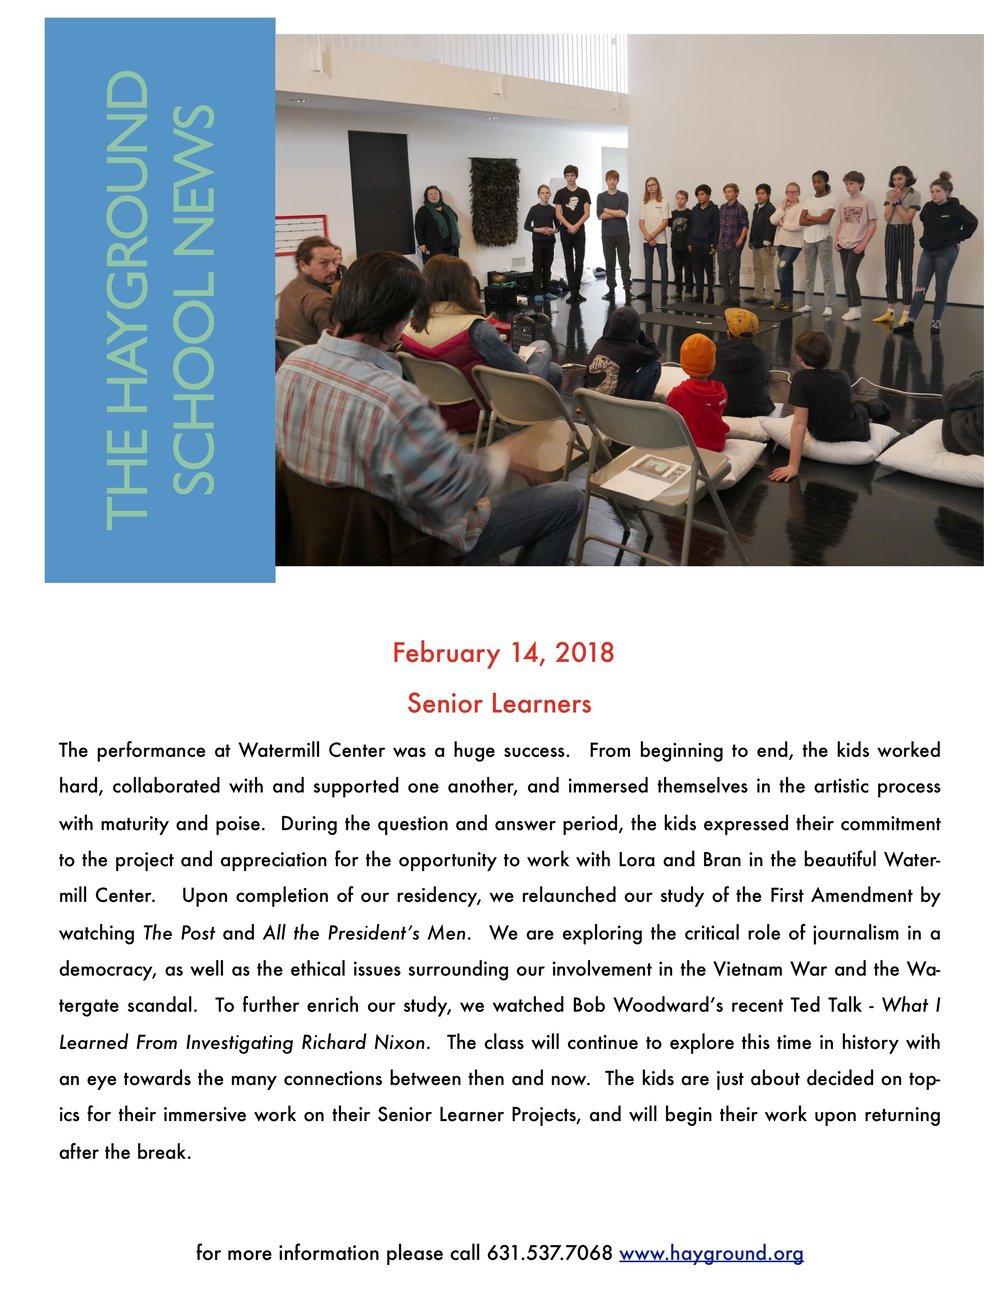 February 2 pdf copy.jpg